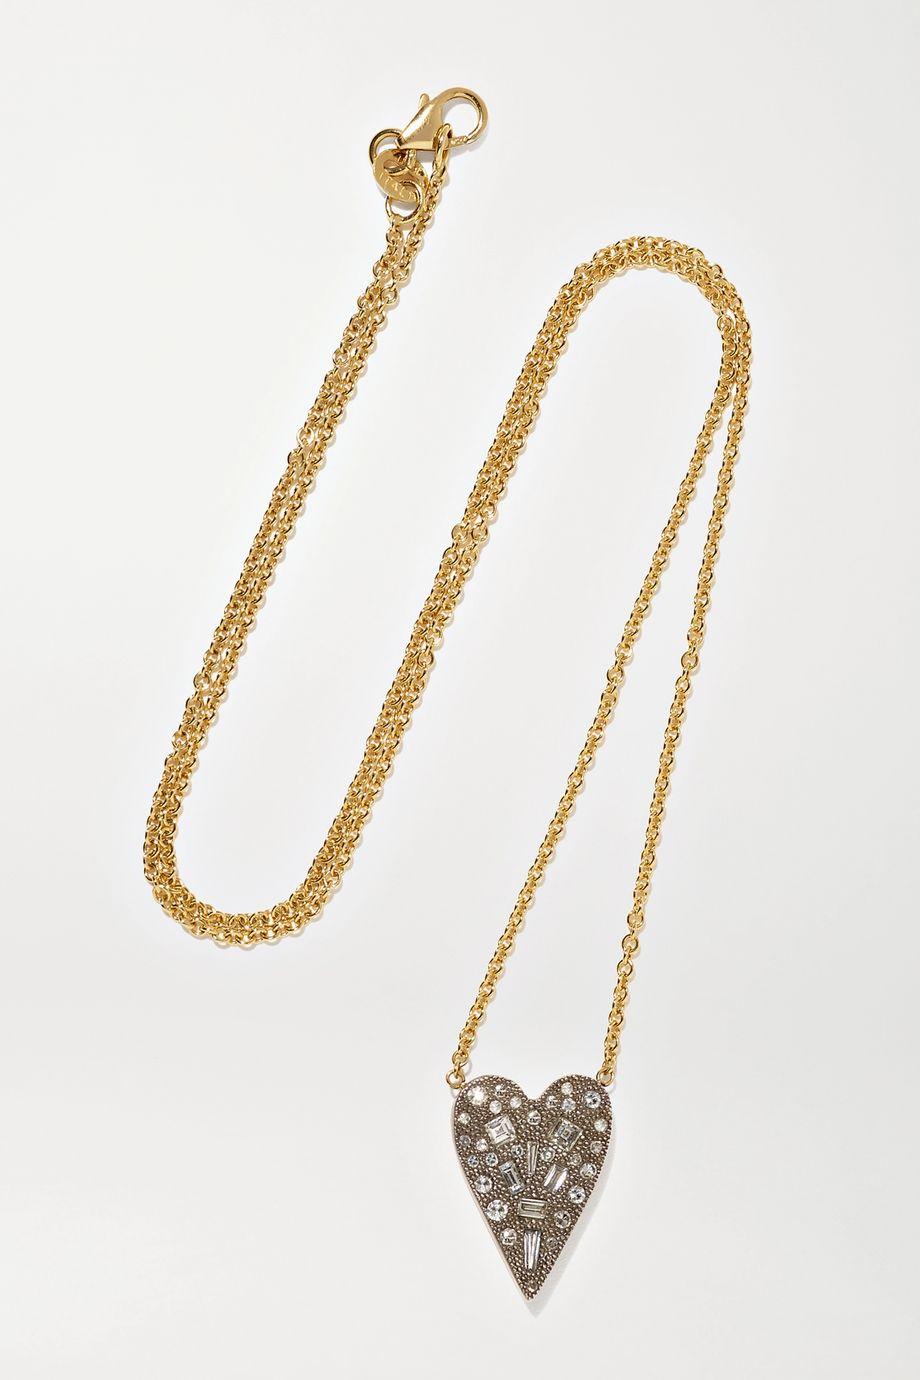 Sylva & Cie 18-karat gold and oxidized sterling silver diamond necklace